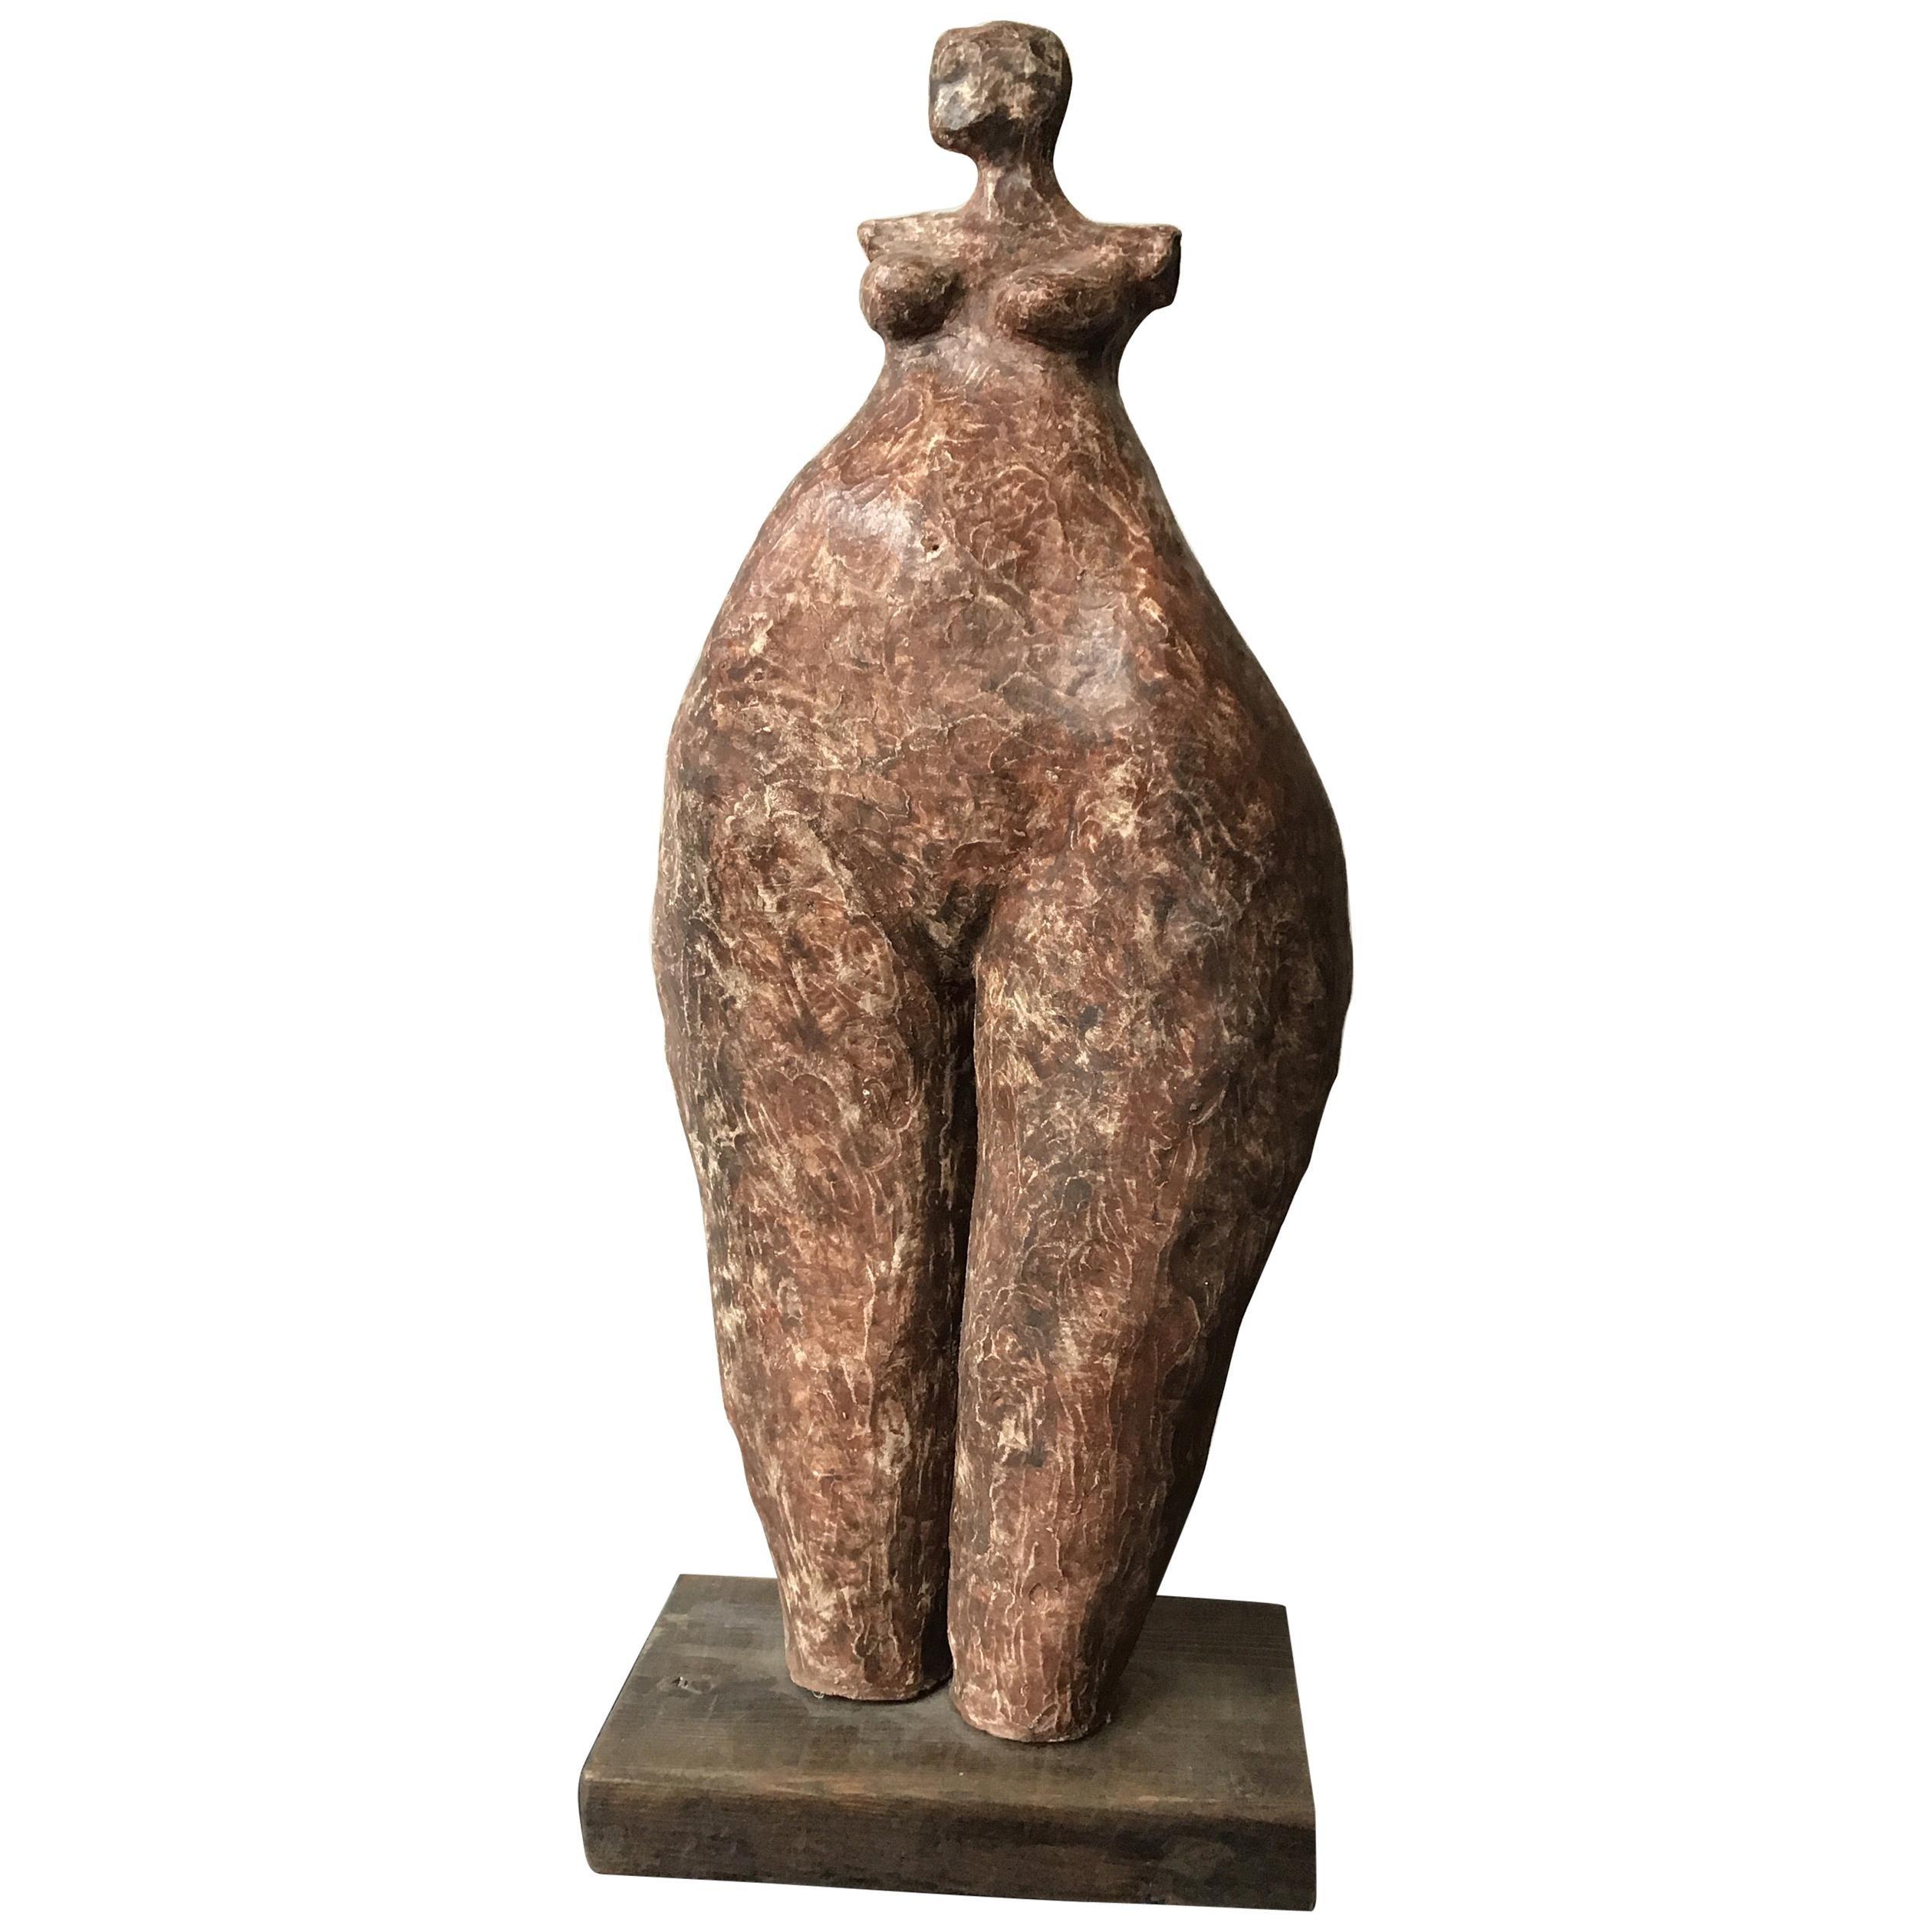 1960s Ceramic Abstract Female Sculpture